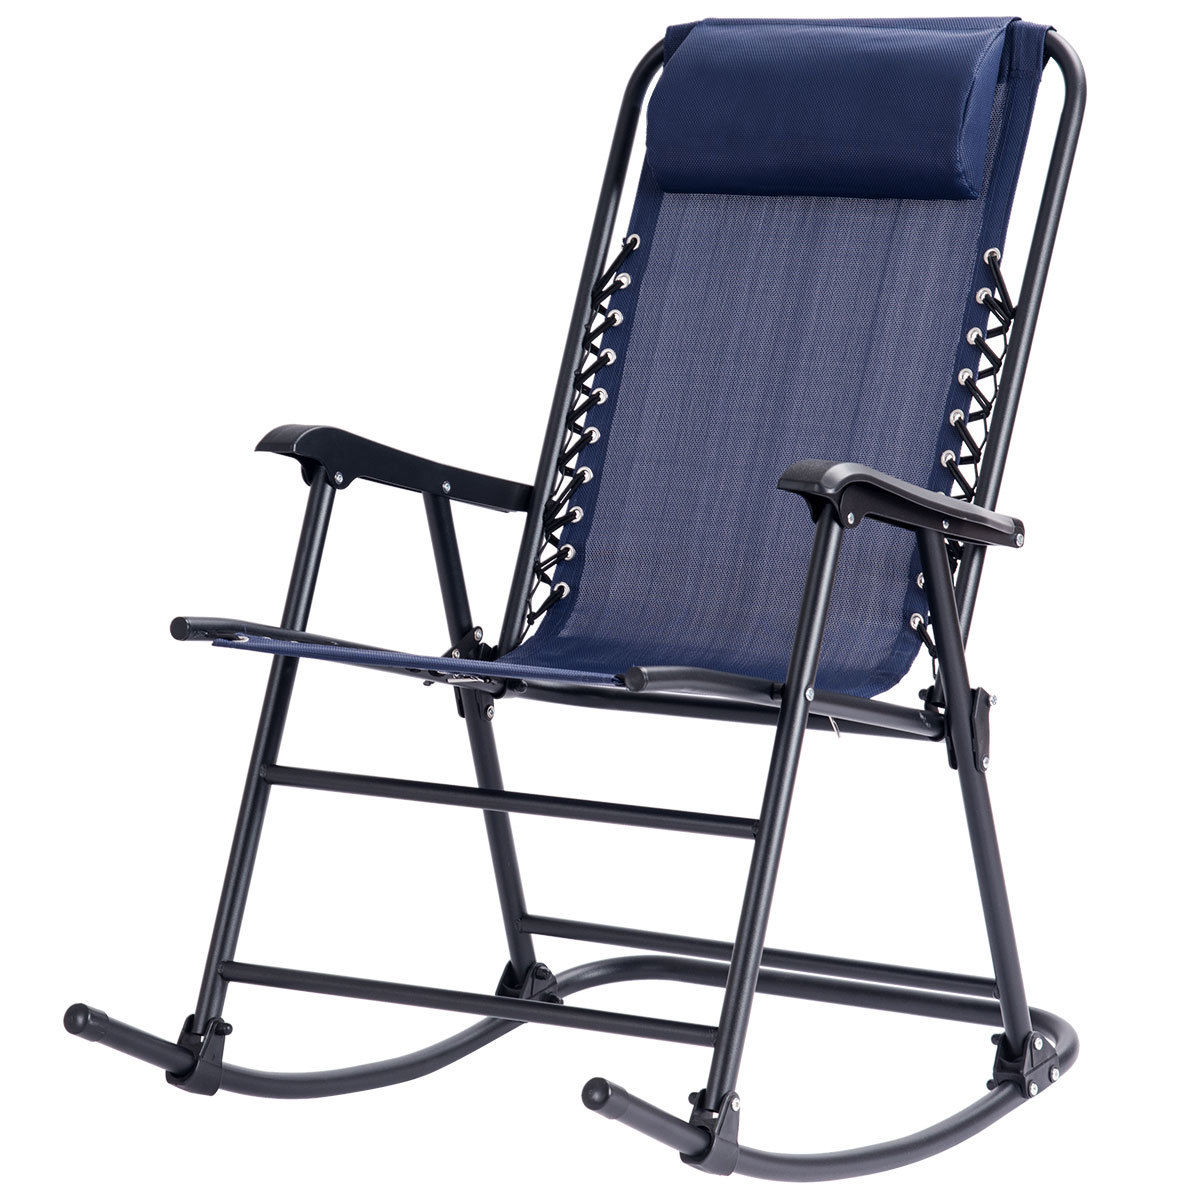 Costway Folding Zero Gravity Rocking Chair Rocker Porch Outdoor Patio Headrest Blue